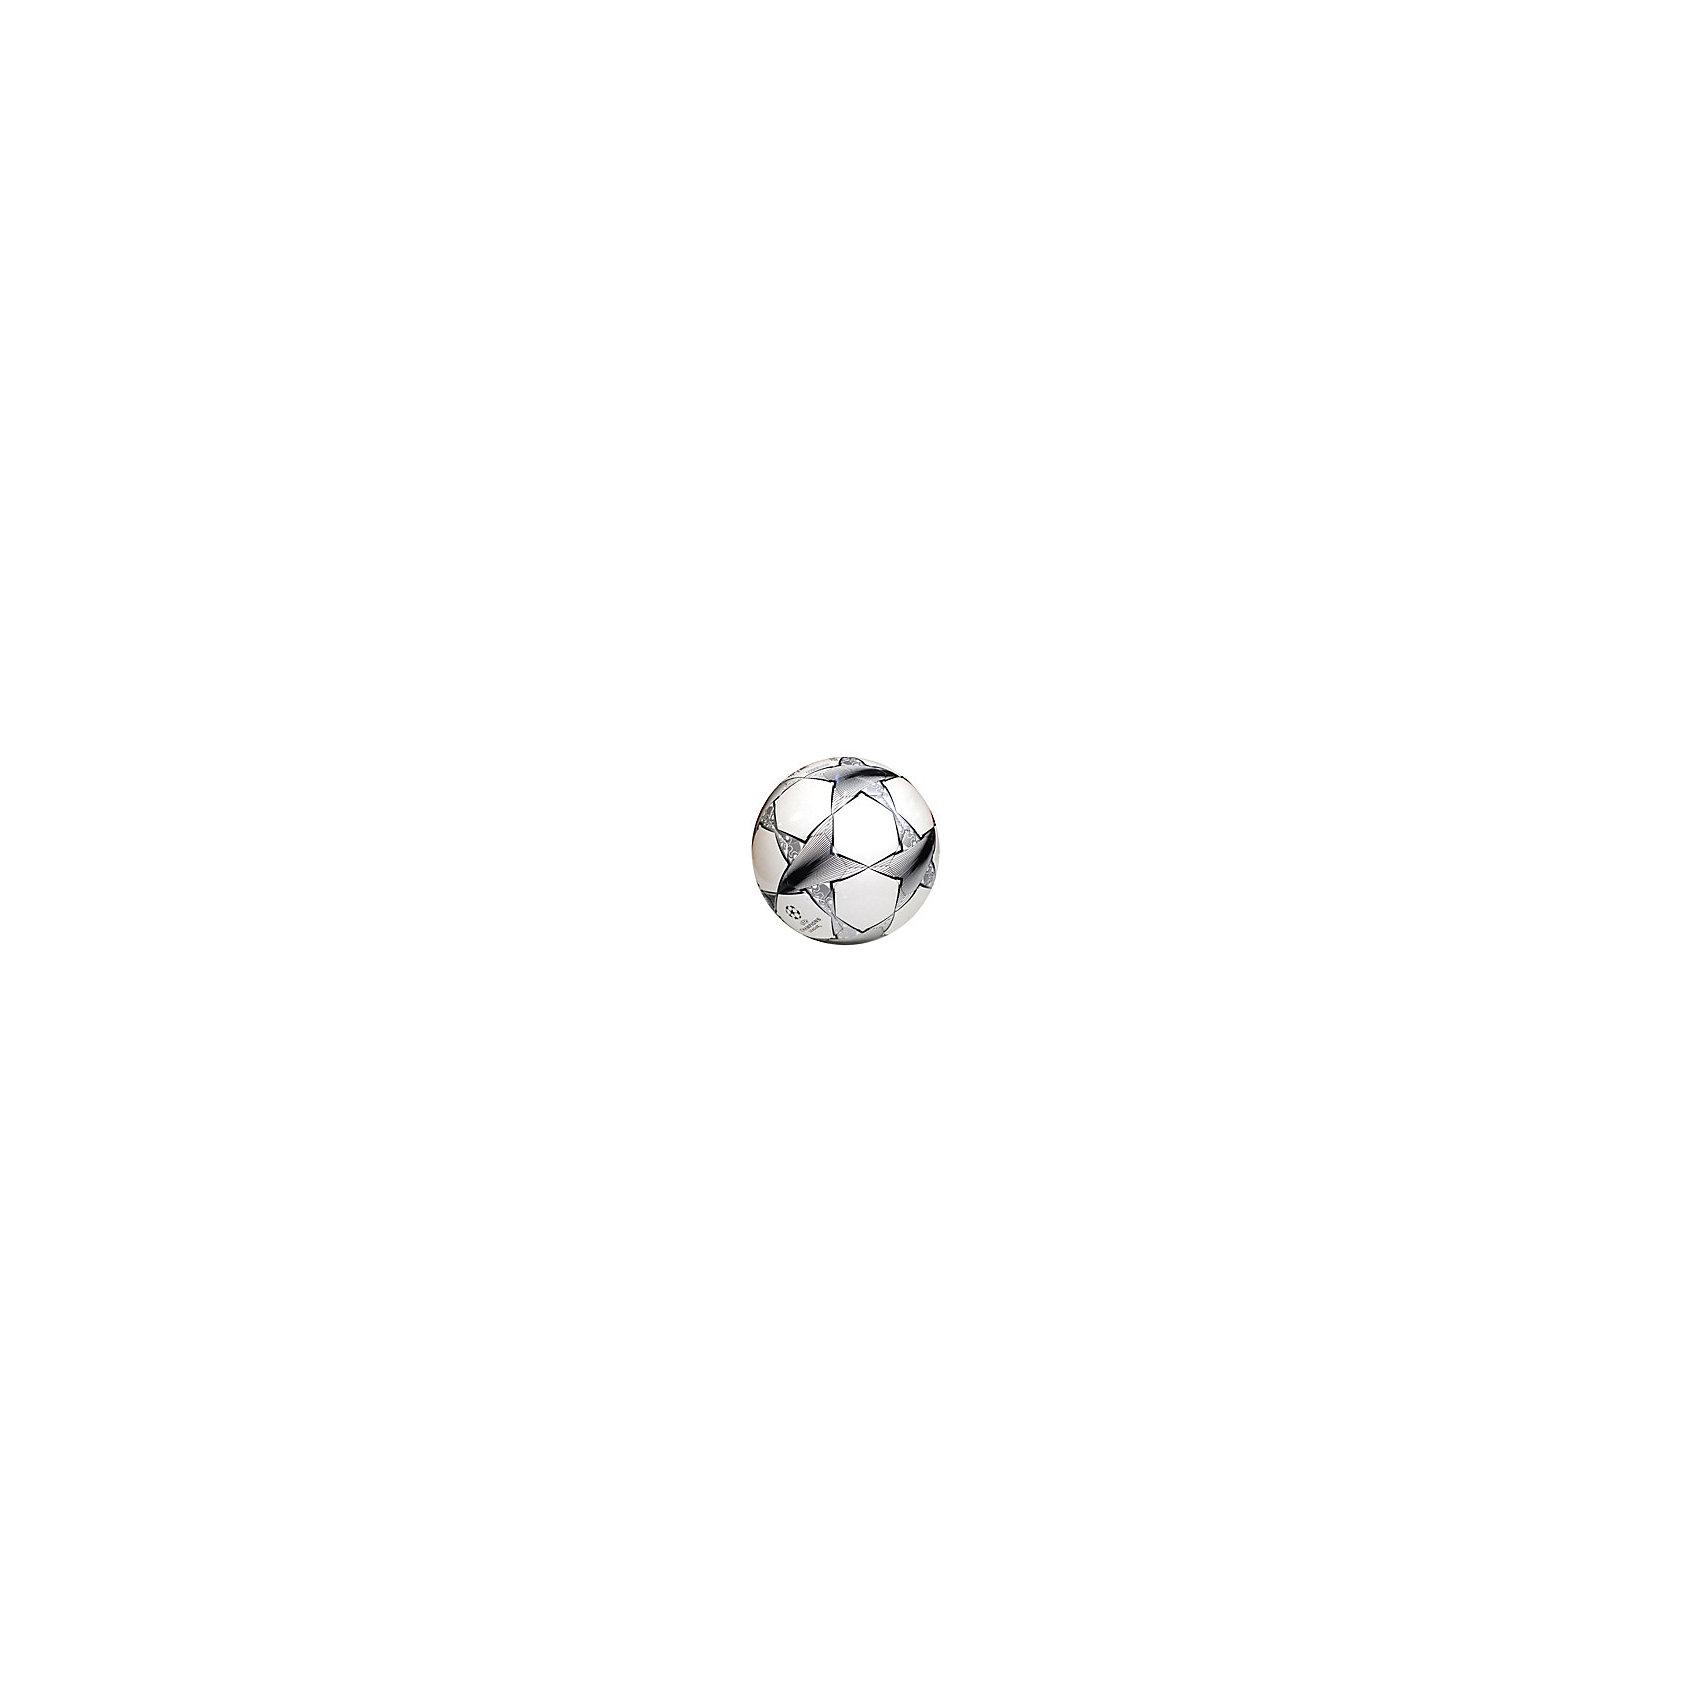 InSummer Футбольный мяч Звездный, InSummer insummer конус красный insummer